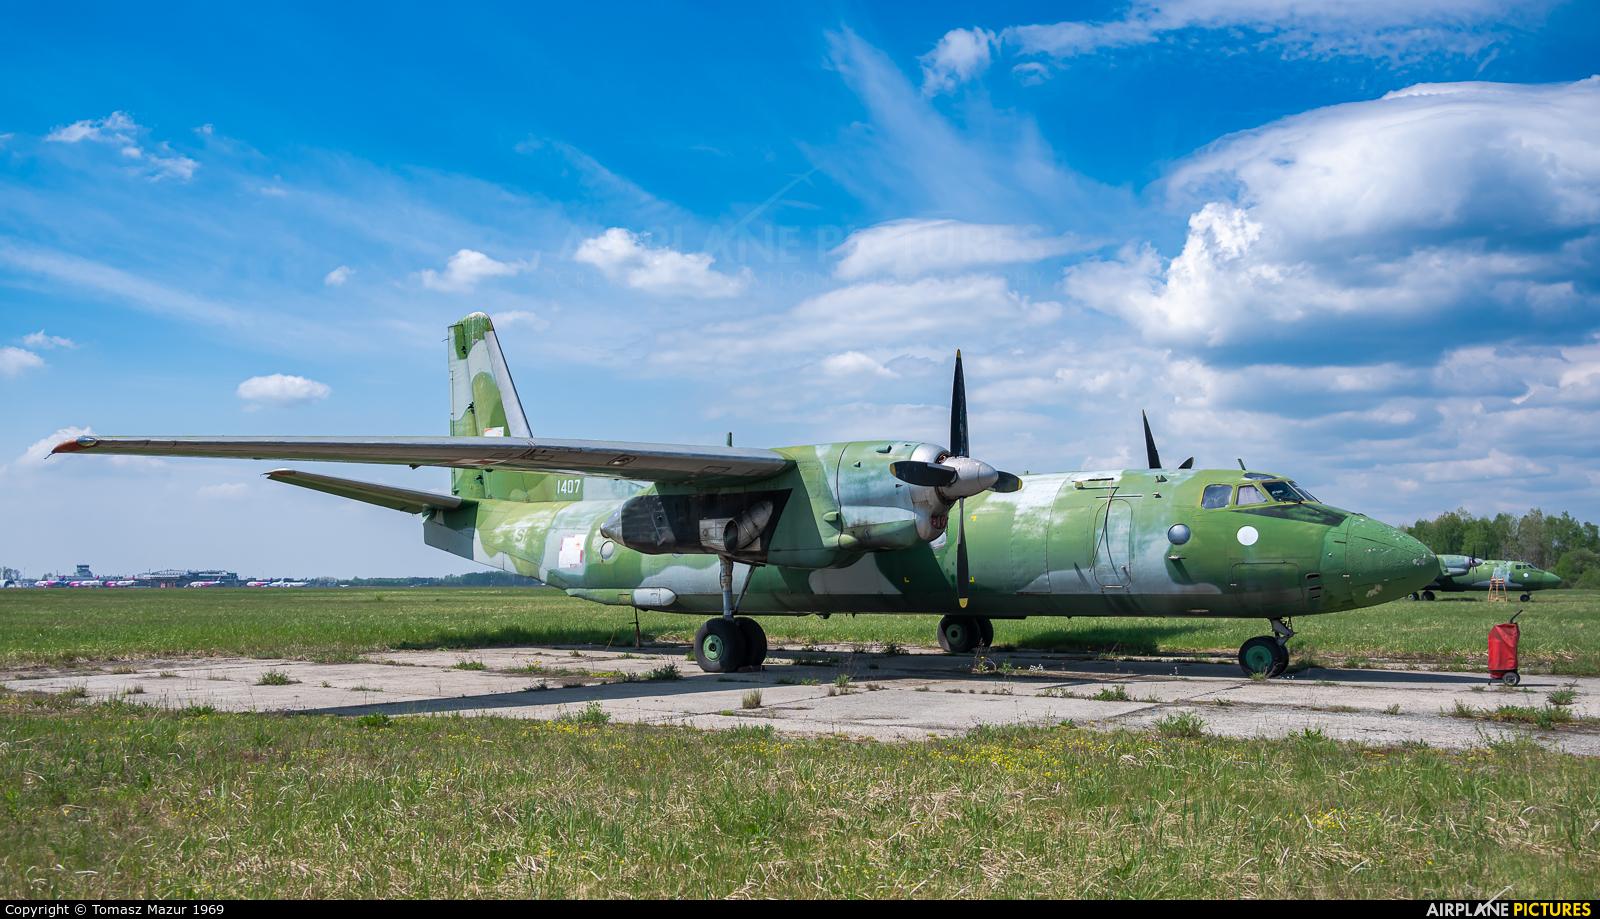 Poland - Air Force 1407 aircraft at Katowice - Pyrzowice